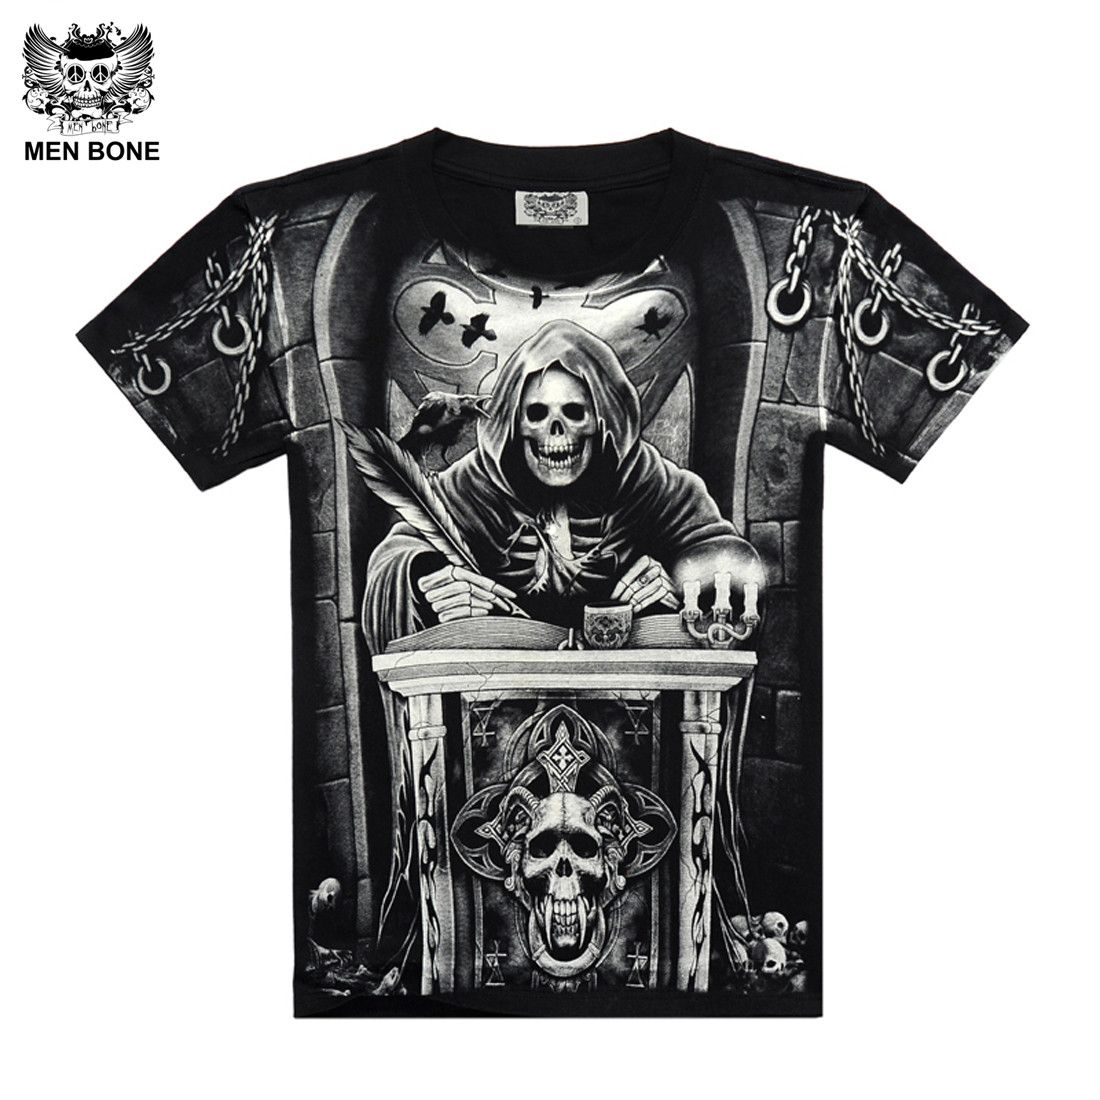 [Hommes os] Heavy Metal Style faucheuse crâne T-shirt noir Noir Imprimer shirt Hip Hop rue rock heavy metal manches